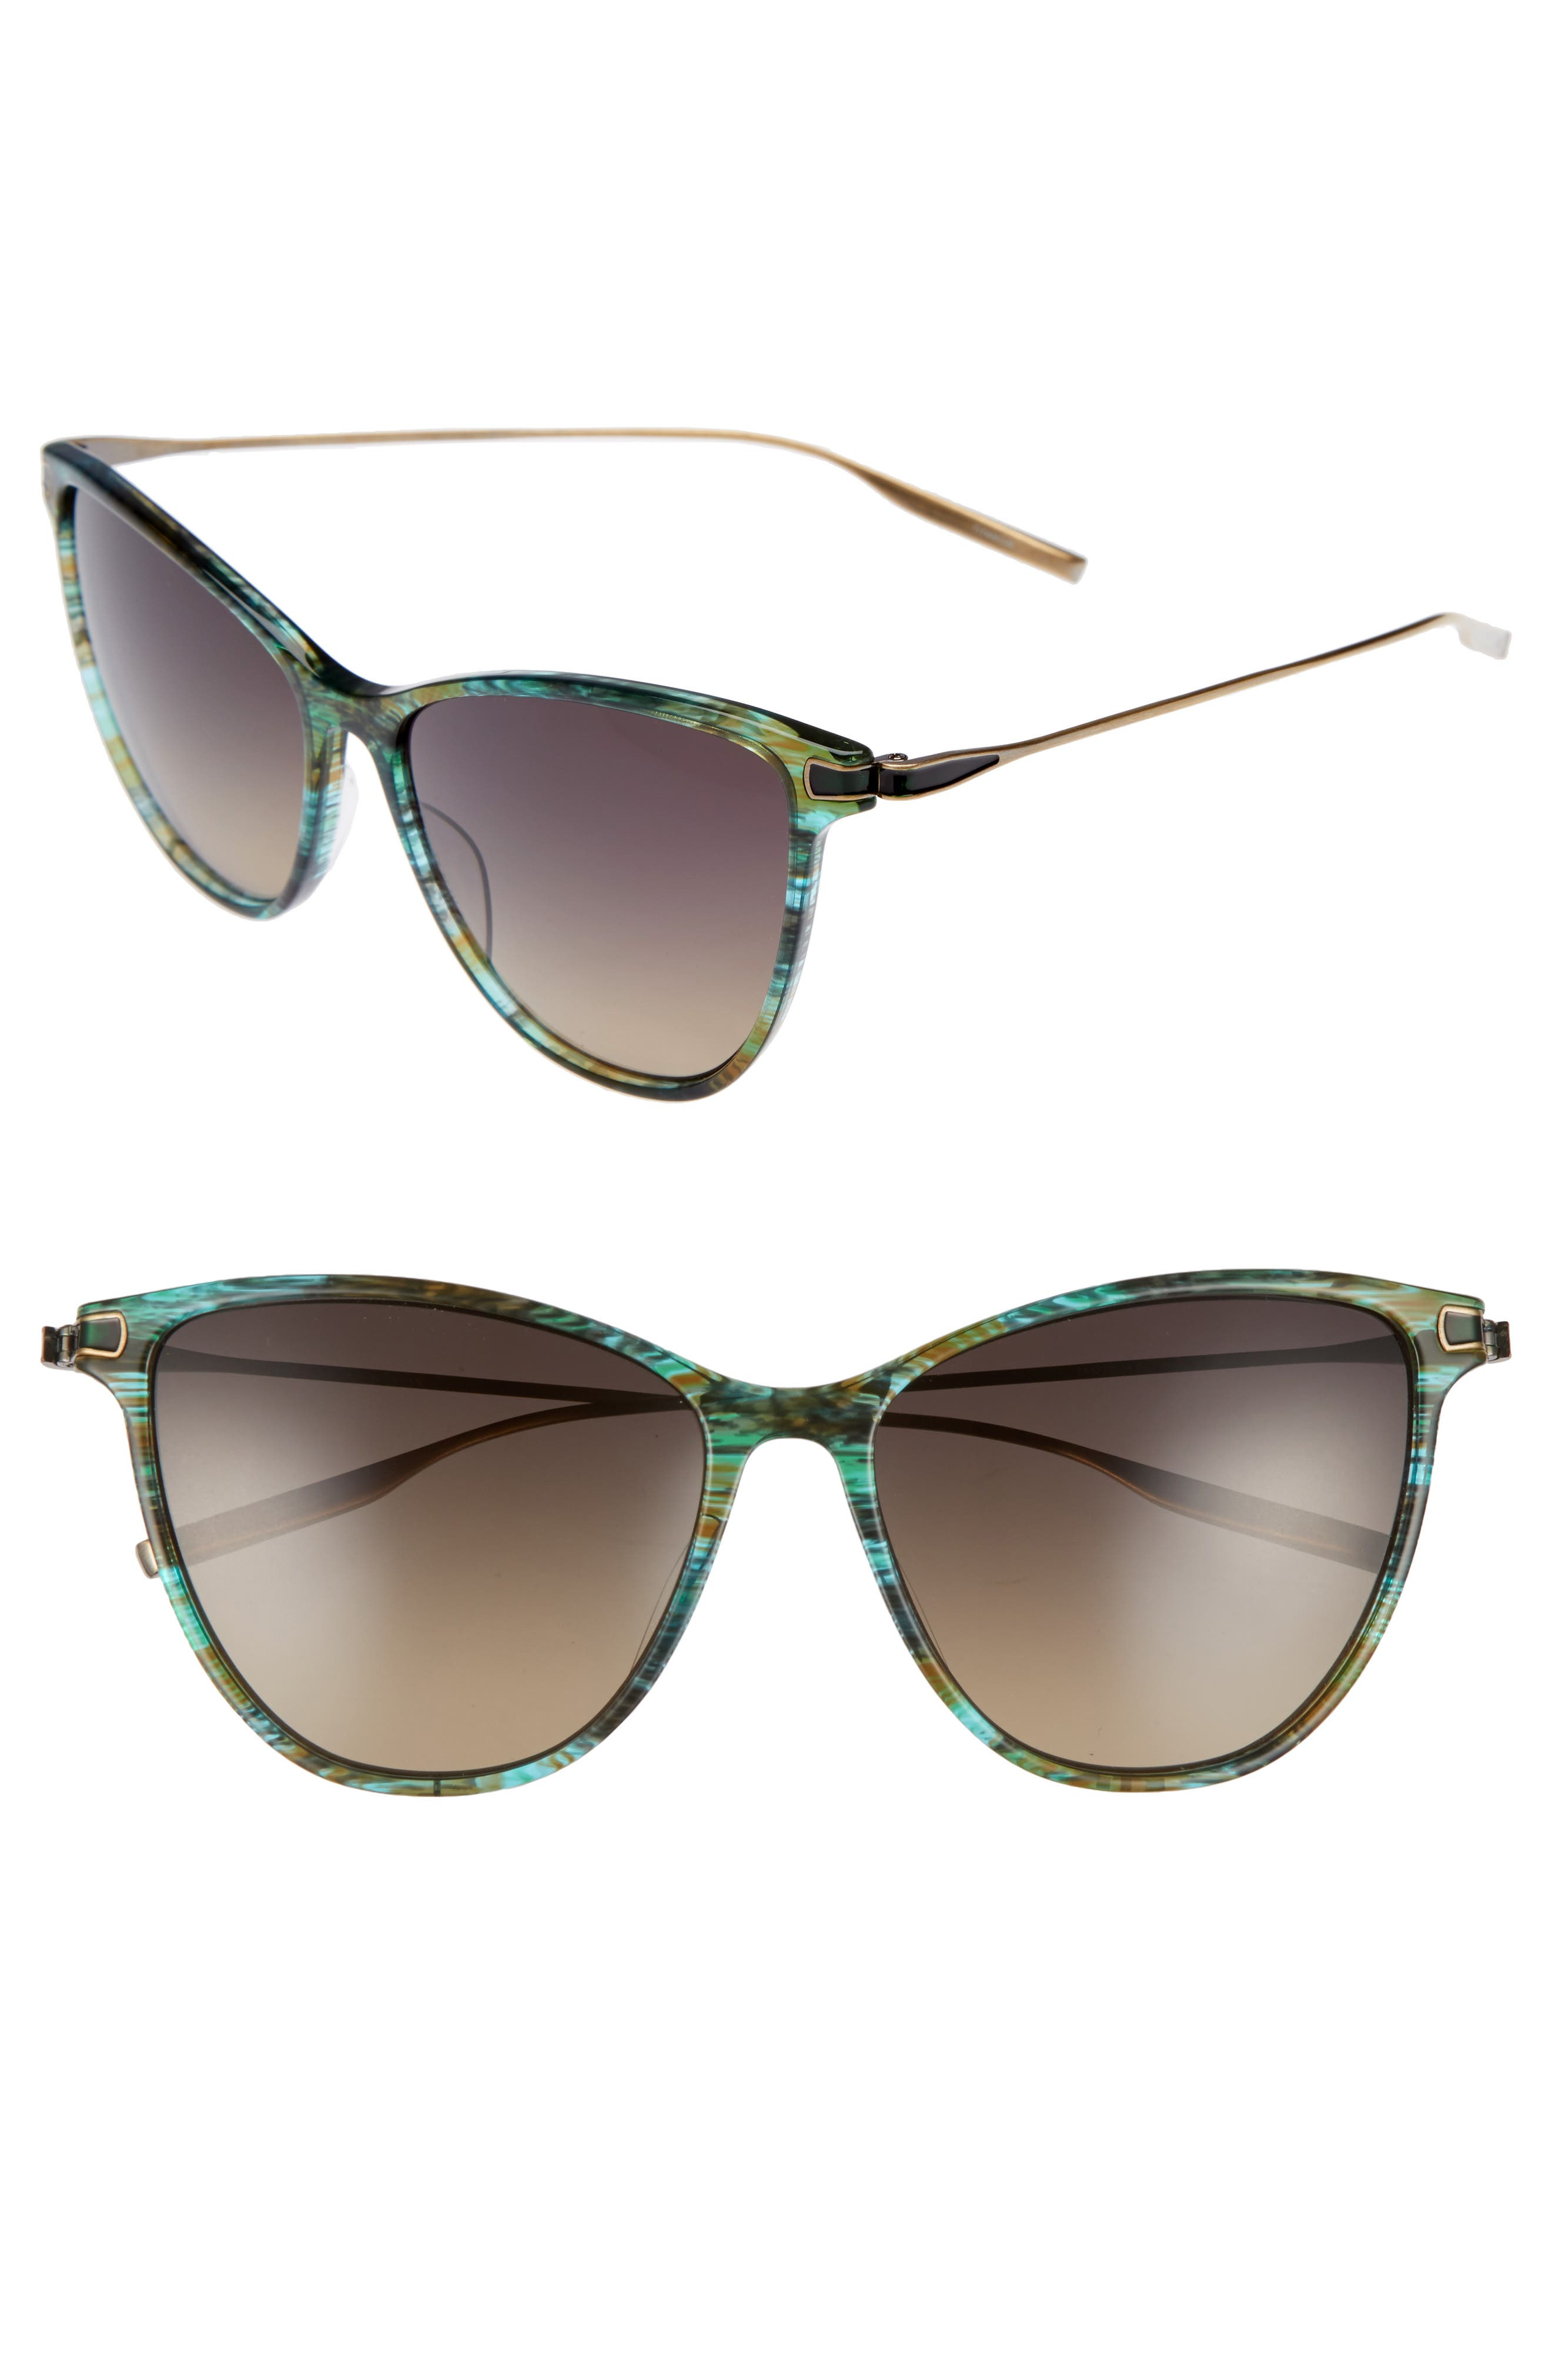 Alternate Image 1 Selected - Salt 58mm Polarized Cat Eye Sunglasses